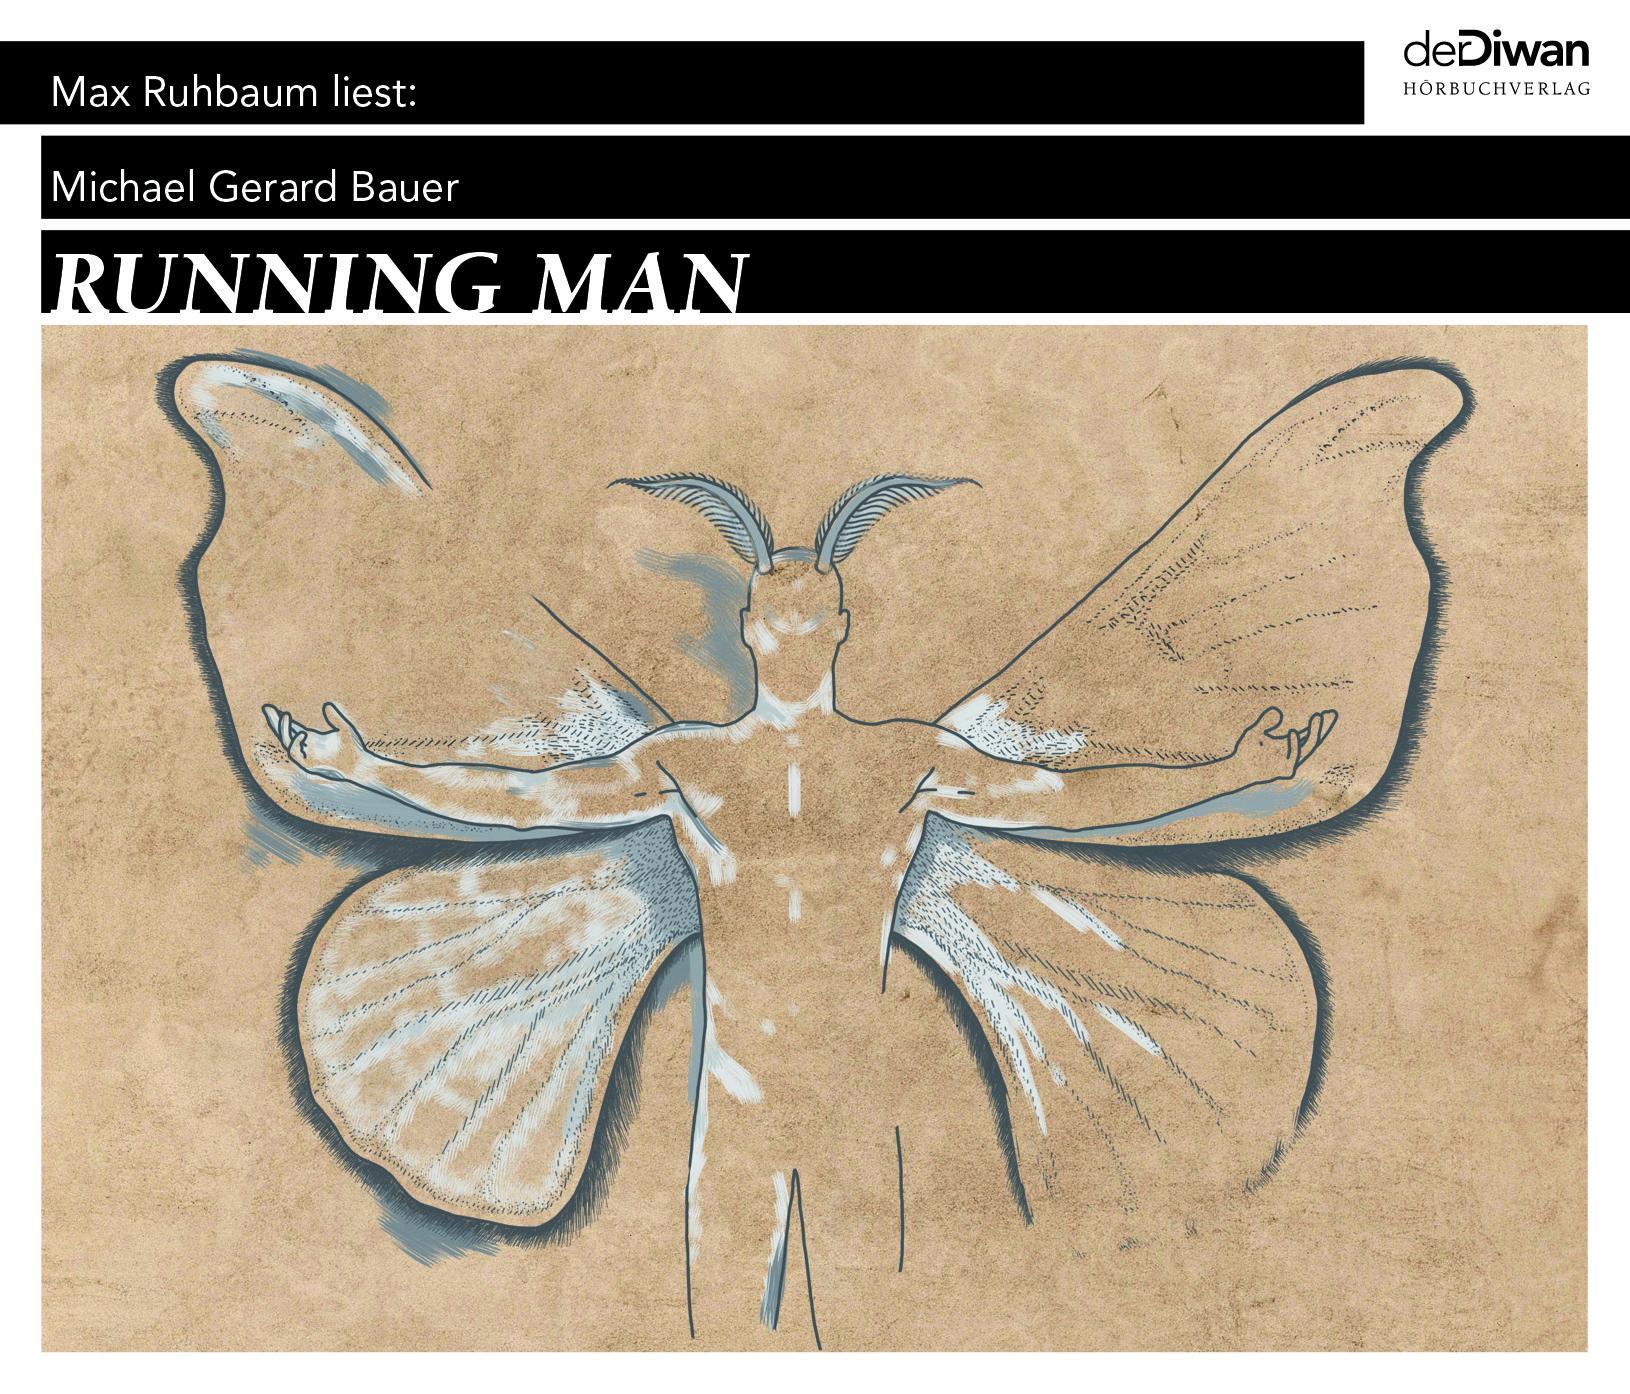 Running Man  Michael Gerard Bauer  Audio-CD  Jewelcase  6 Audio-CDs  Deutsch  2019 - Bauer, Michael Gerard